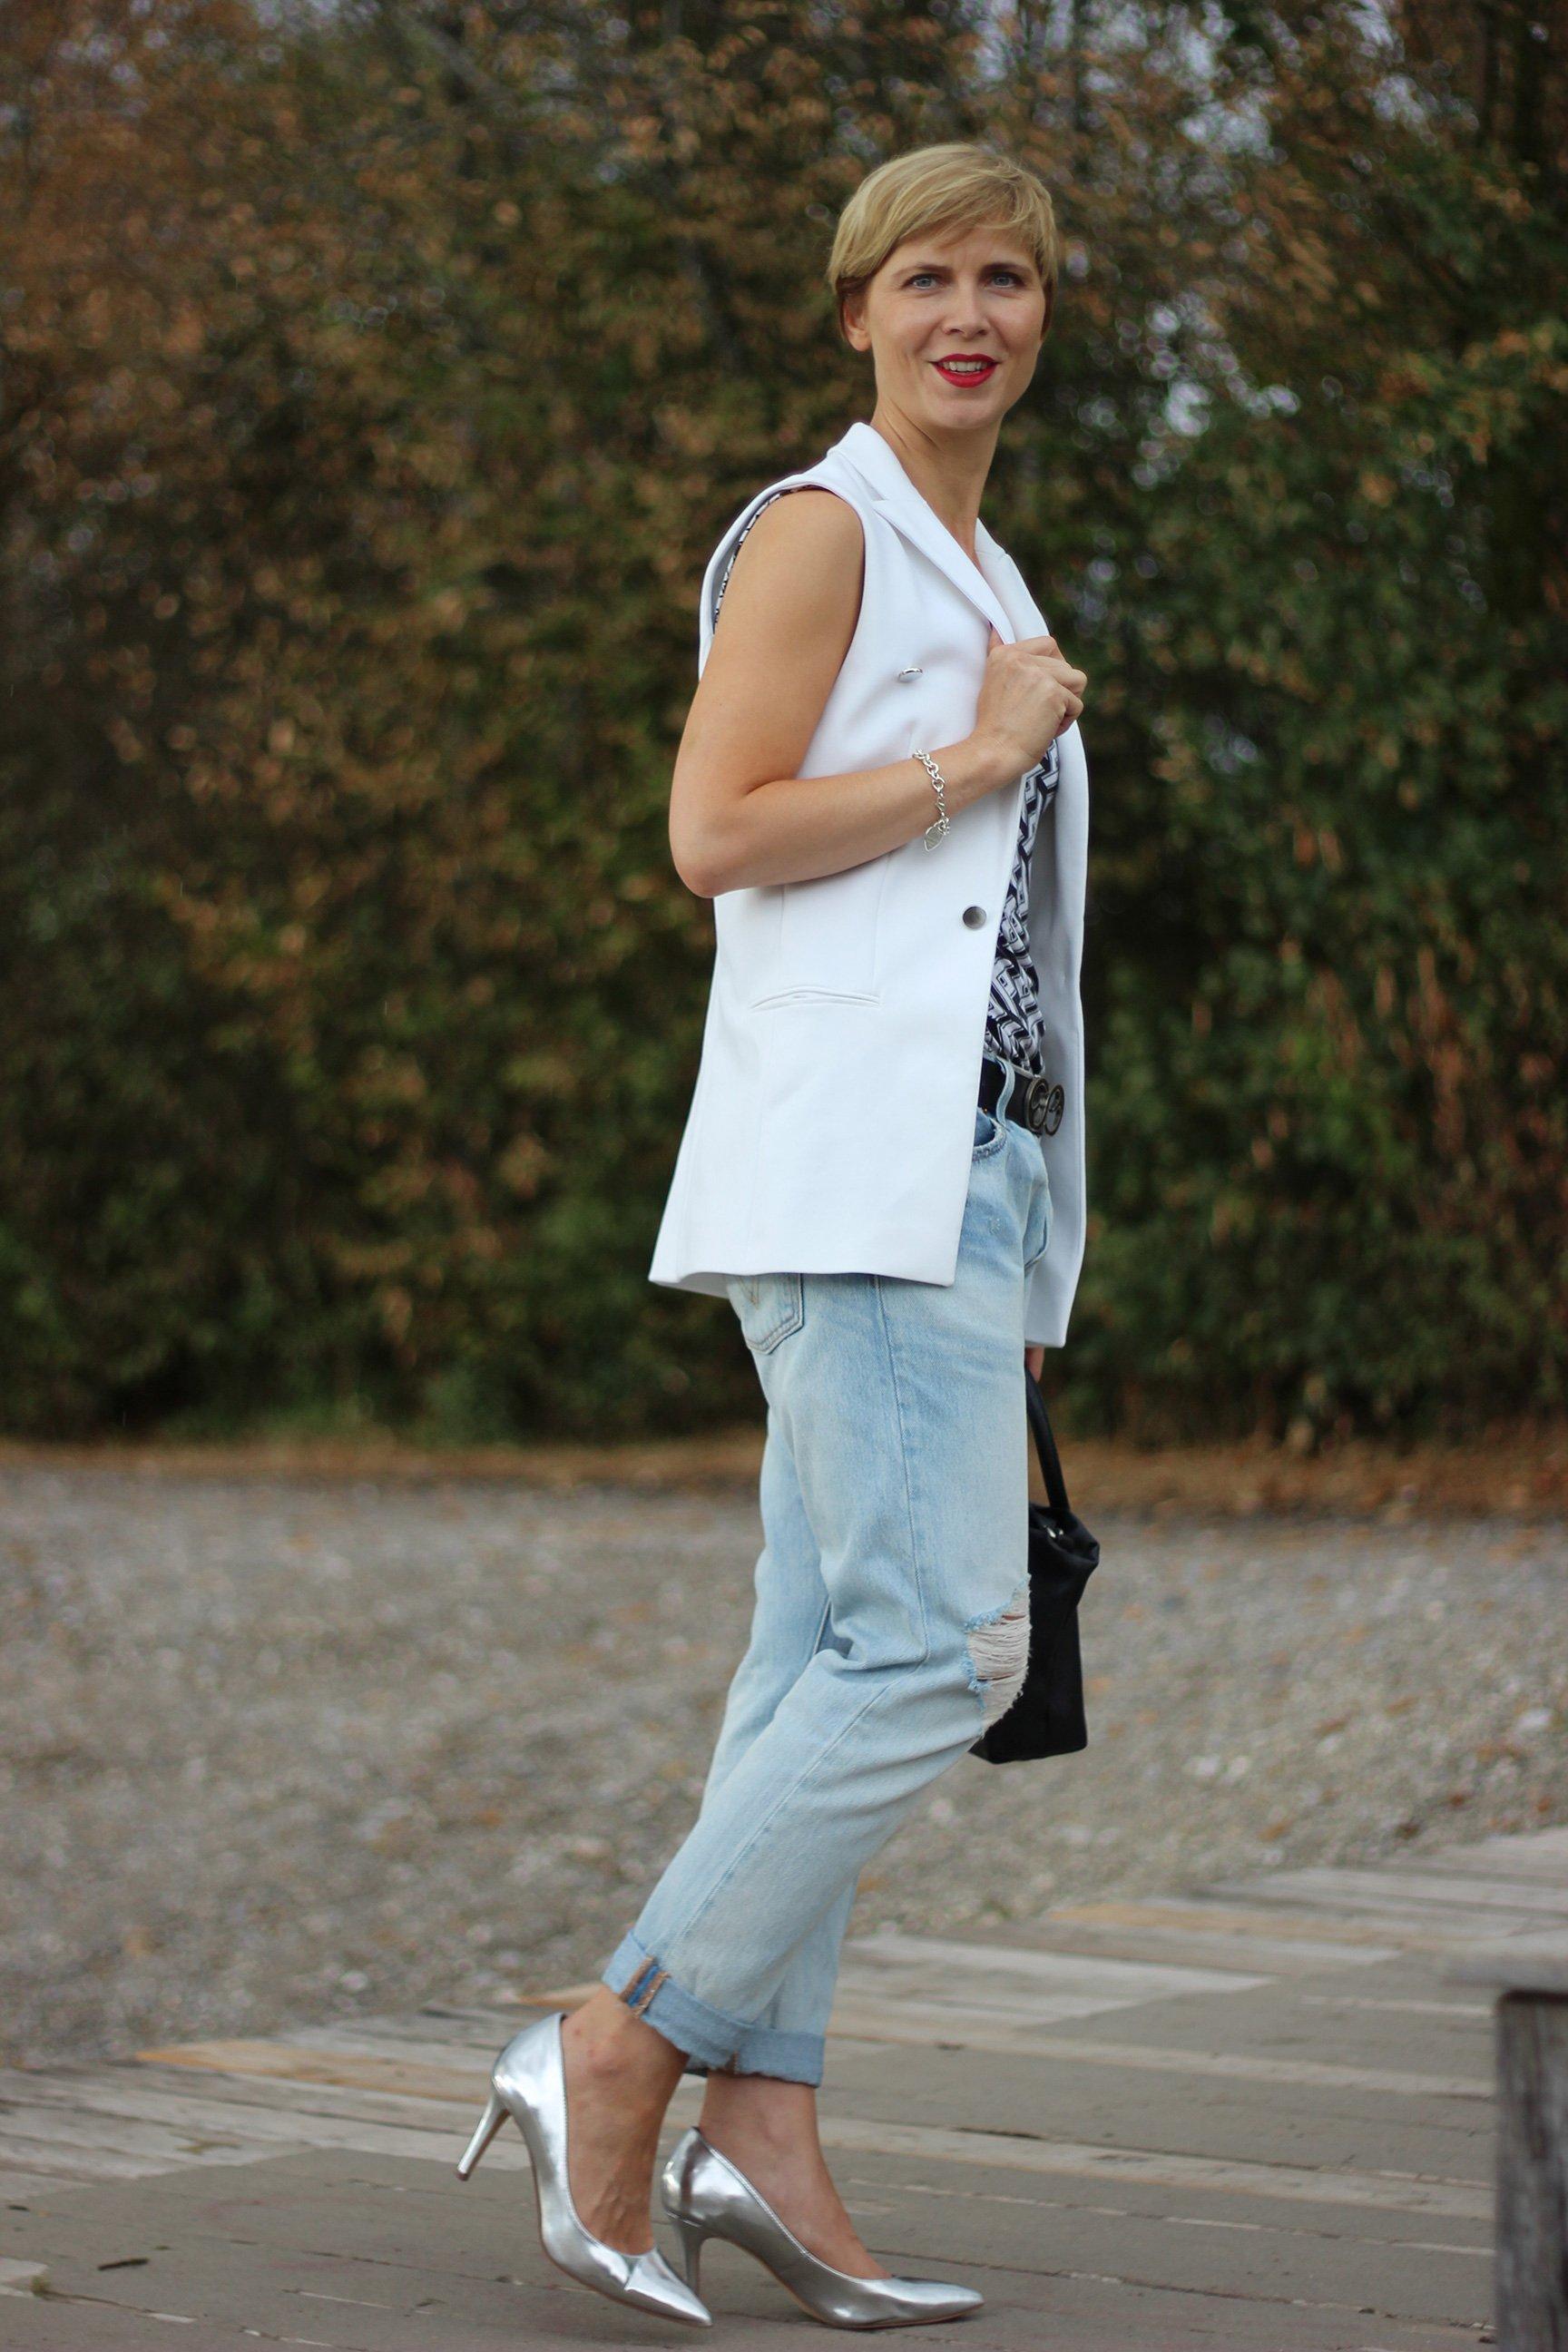 IMG_0508a_Levis501_DestroyedJeans_ü40_fashionblog_oui_weste_MetallicHeels_blackandwhite_schwarz_weiß_Top_casual_Ahemadundahos